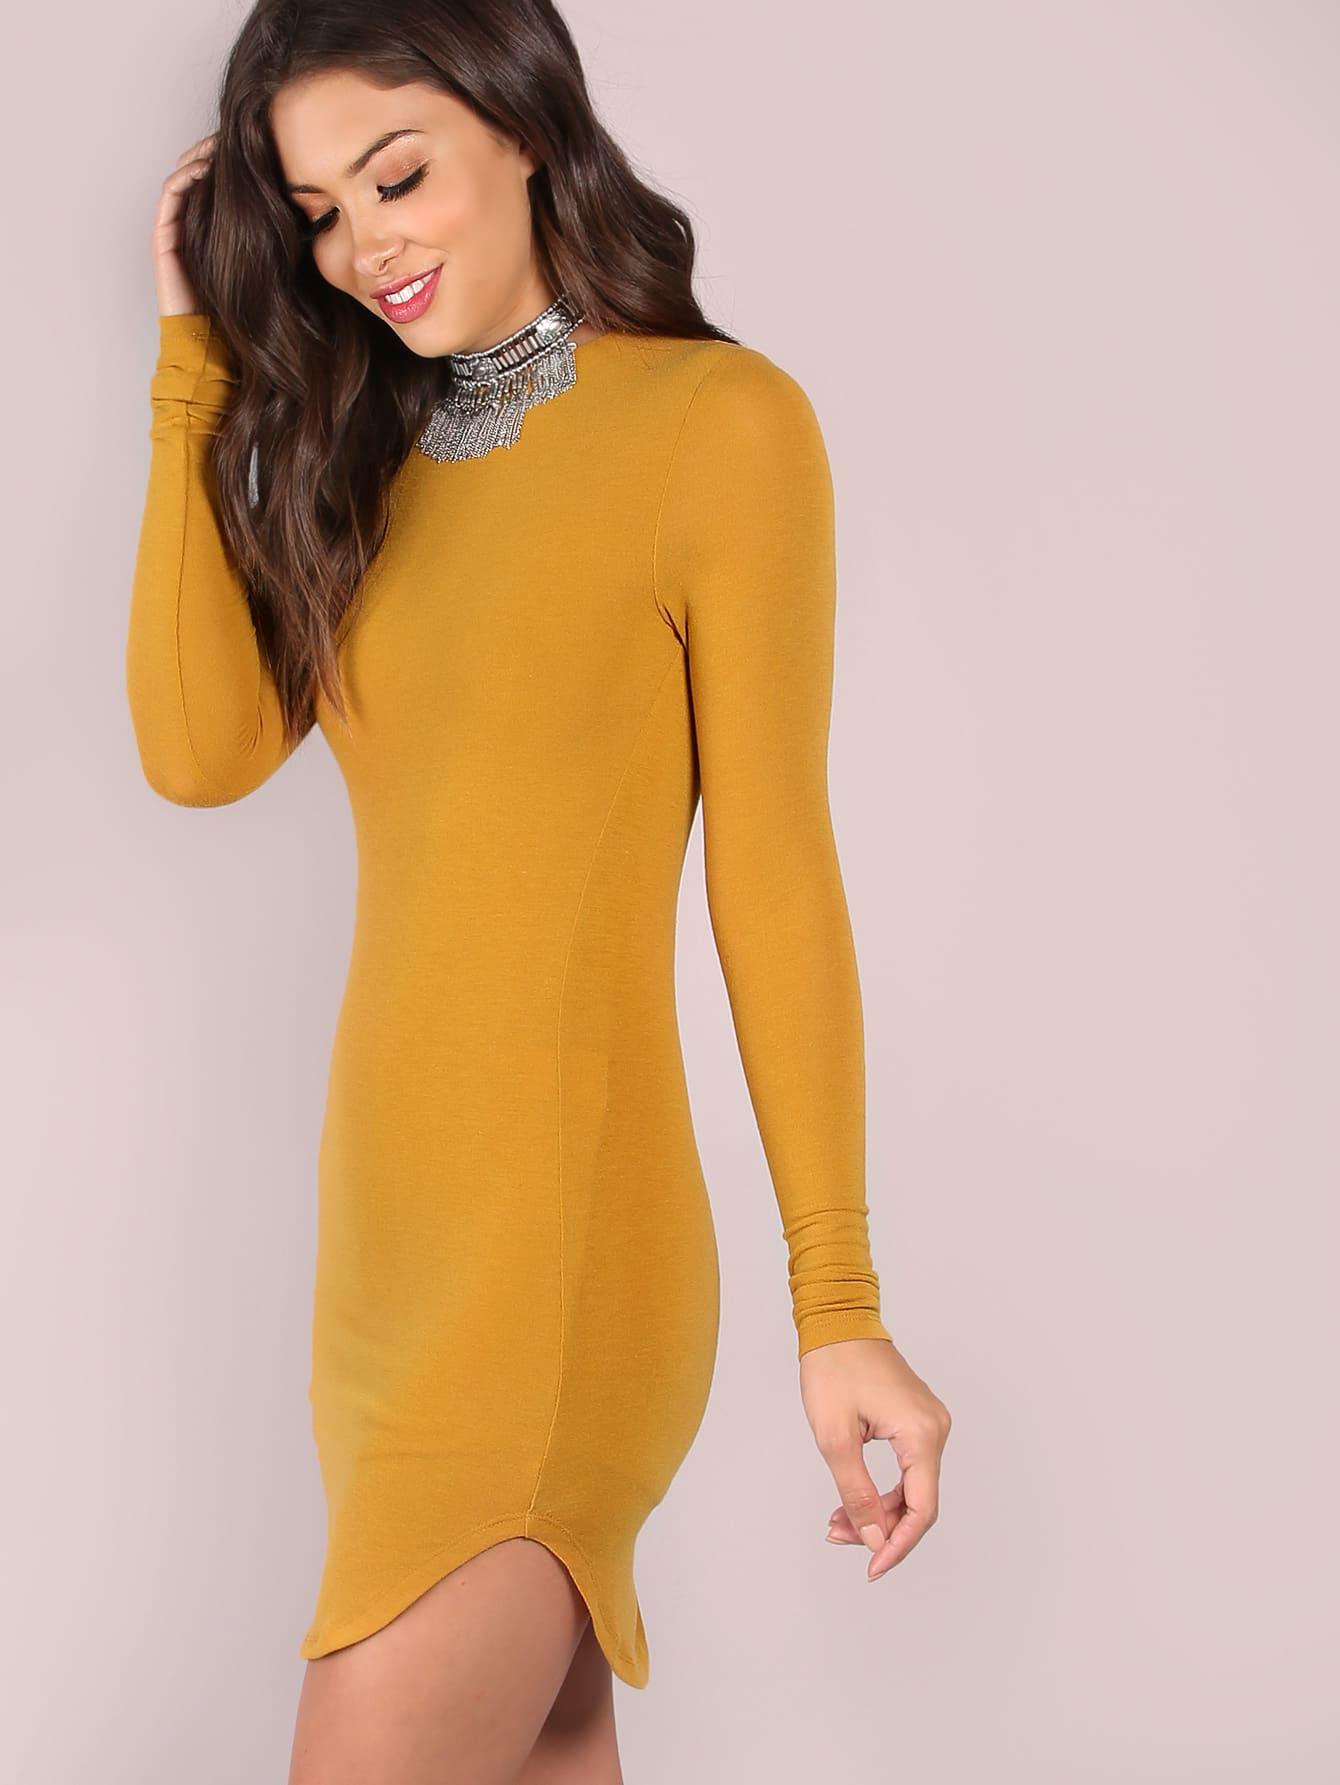 Plus long bodycon size yellow dresses live georgetown